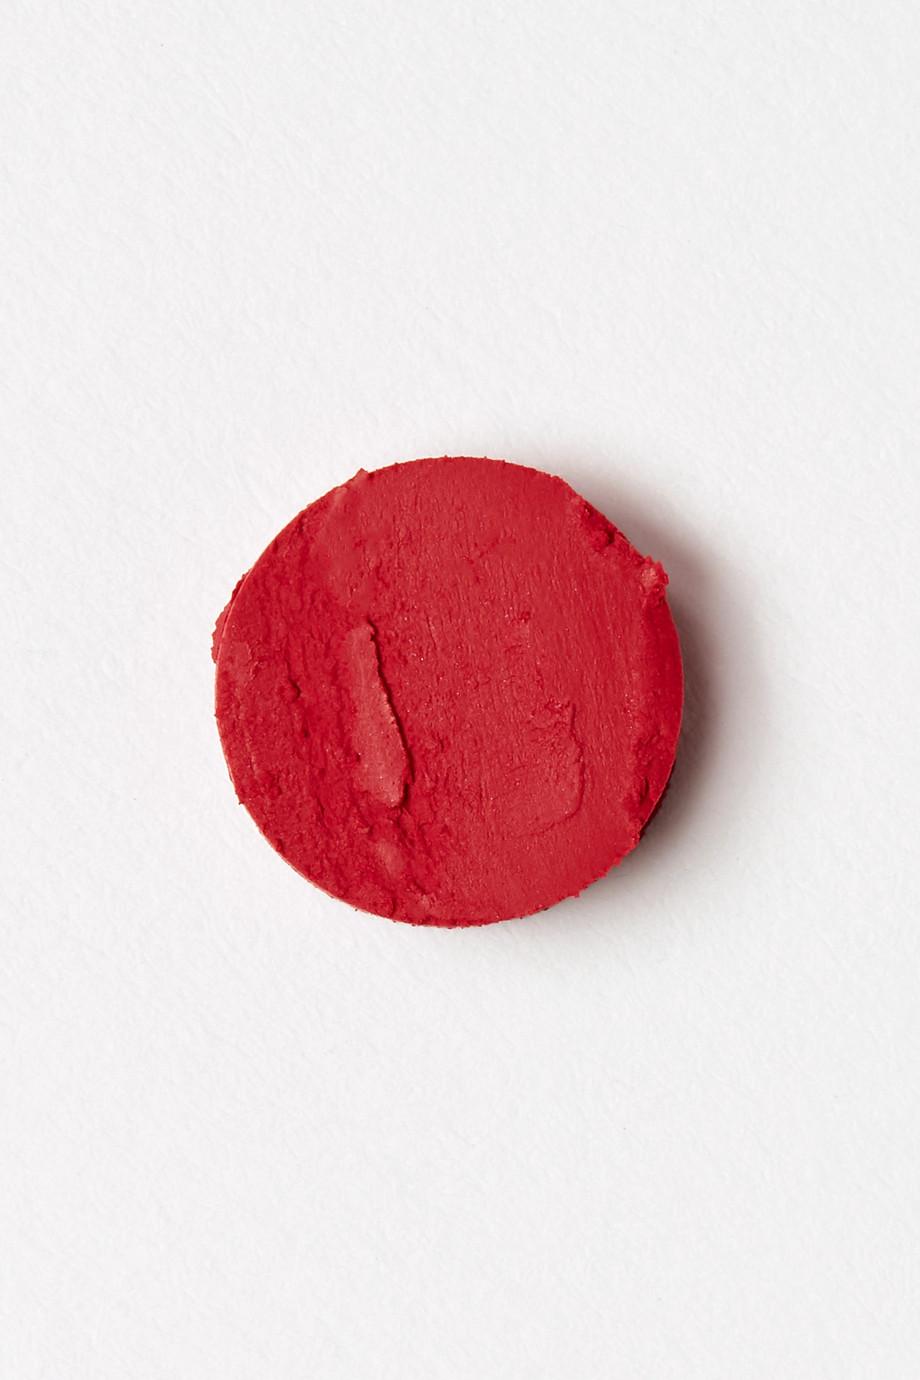 Gucci Beauty Rouge à Lèvres Mat Lipstick - Three Wise Girls 401